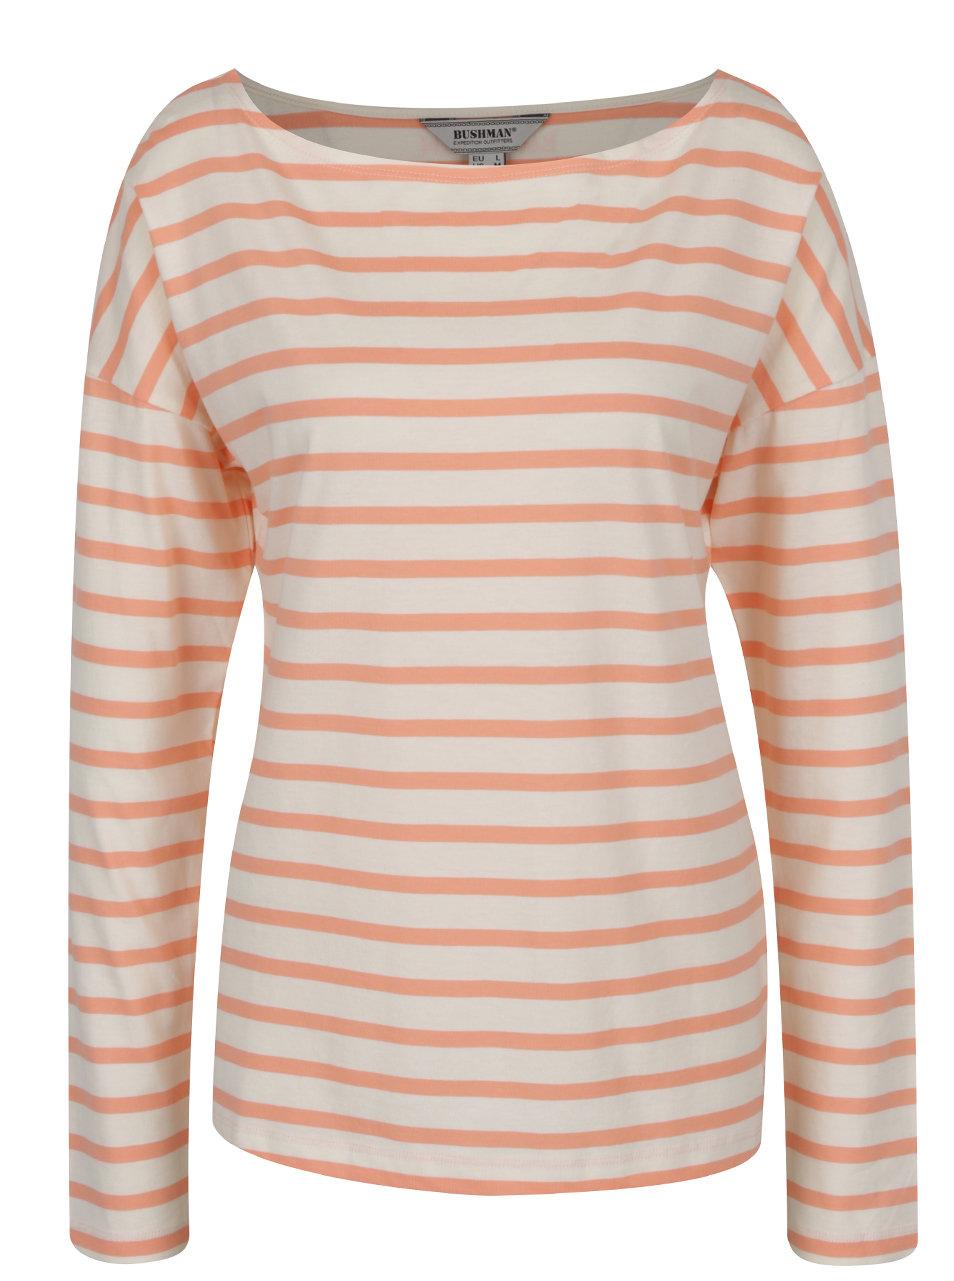 c0205d8fbd0f Oranžovo-krémové dámske pruhované tričko s lodičkovým výstrihom BUSHMAN  Sailora ...